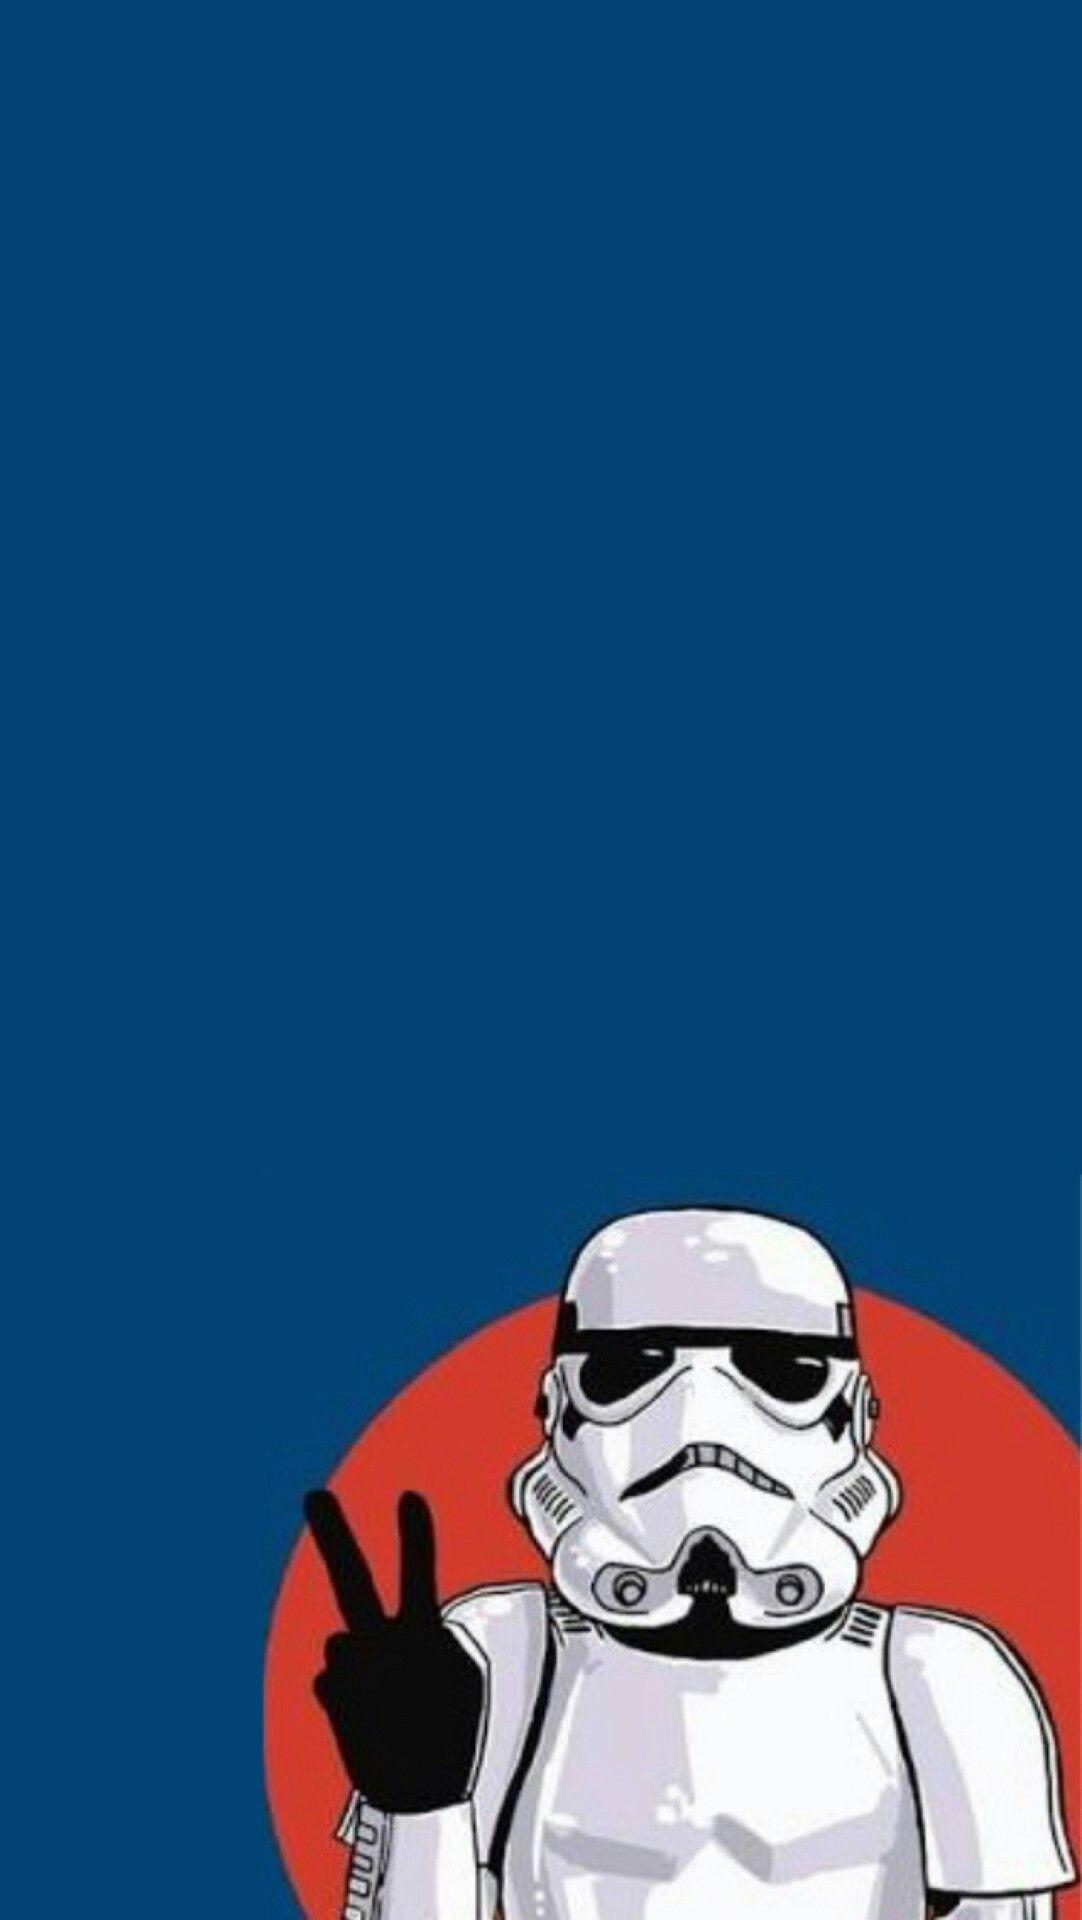 Star Wars Lockscreen   Data Src Star Wars Lock Screen - Star Wars Iphone X , HD Wallpaper & Backgrounds